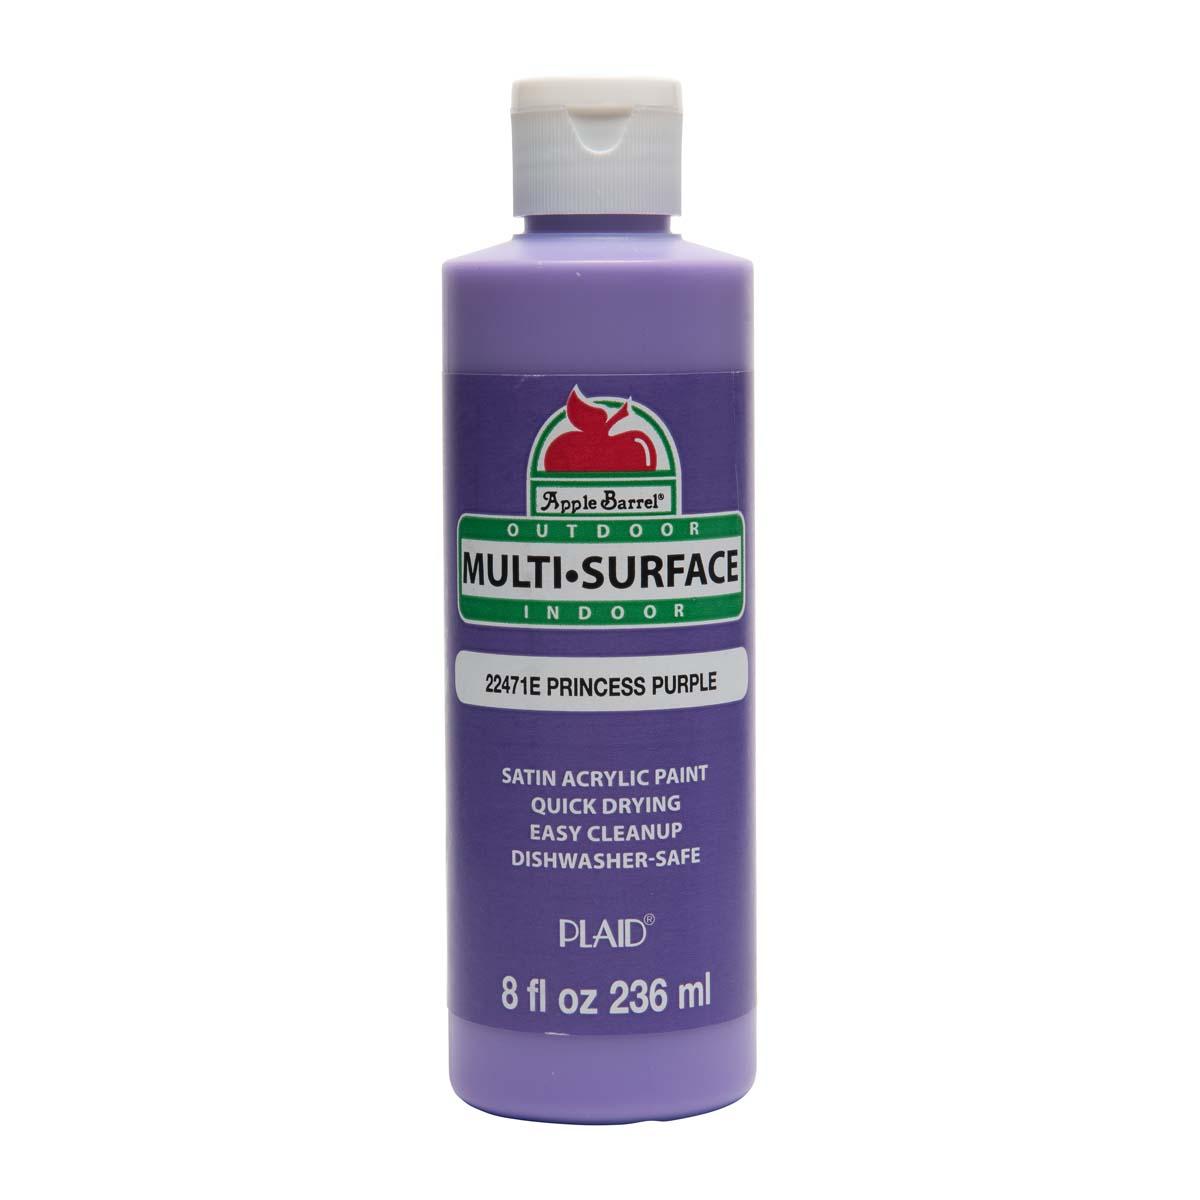 Apple Barrel ® Multi-Surface Satin Acrylic Paints - Princess Purple, 8 oz. - 22471E